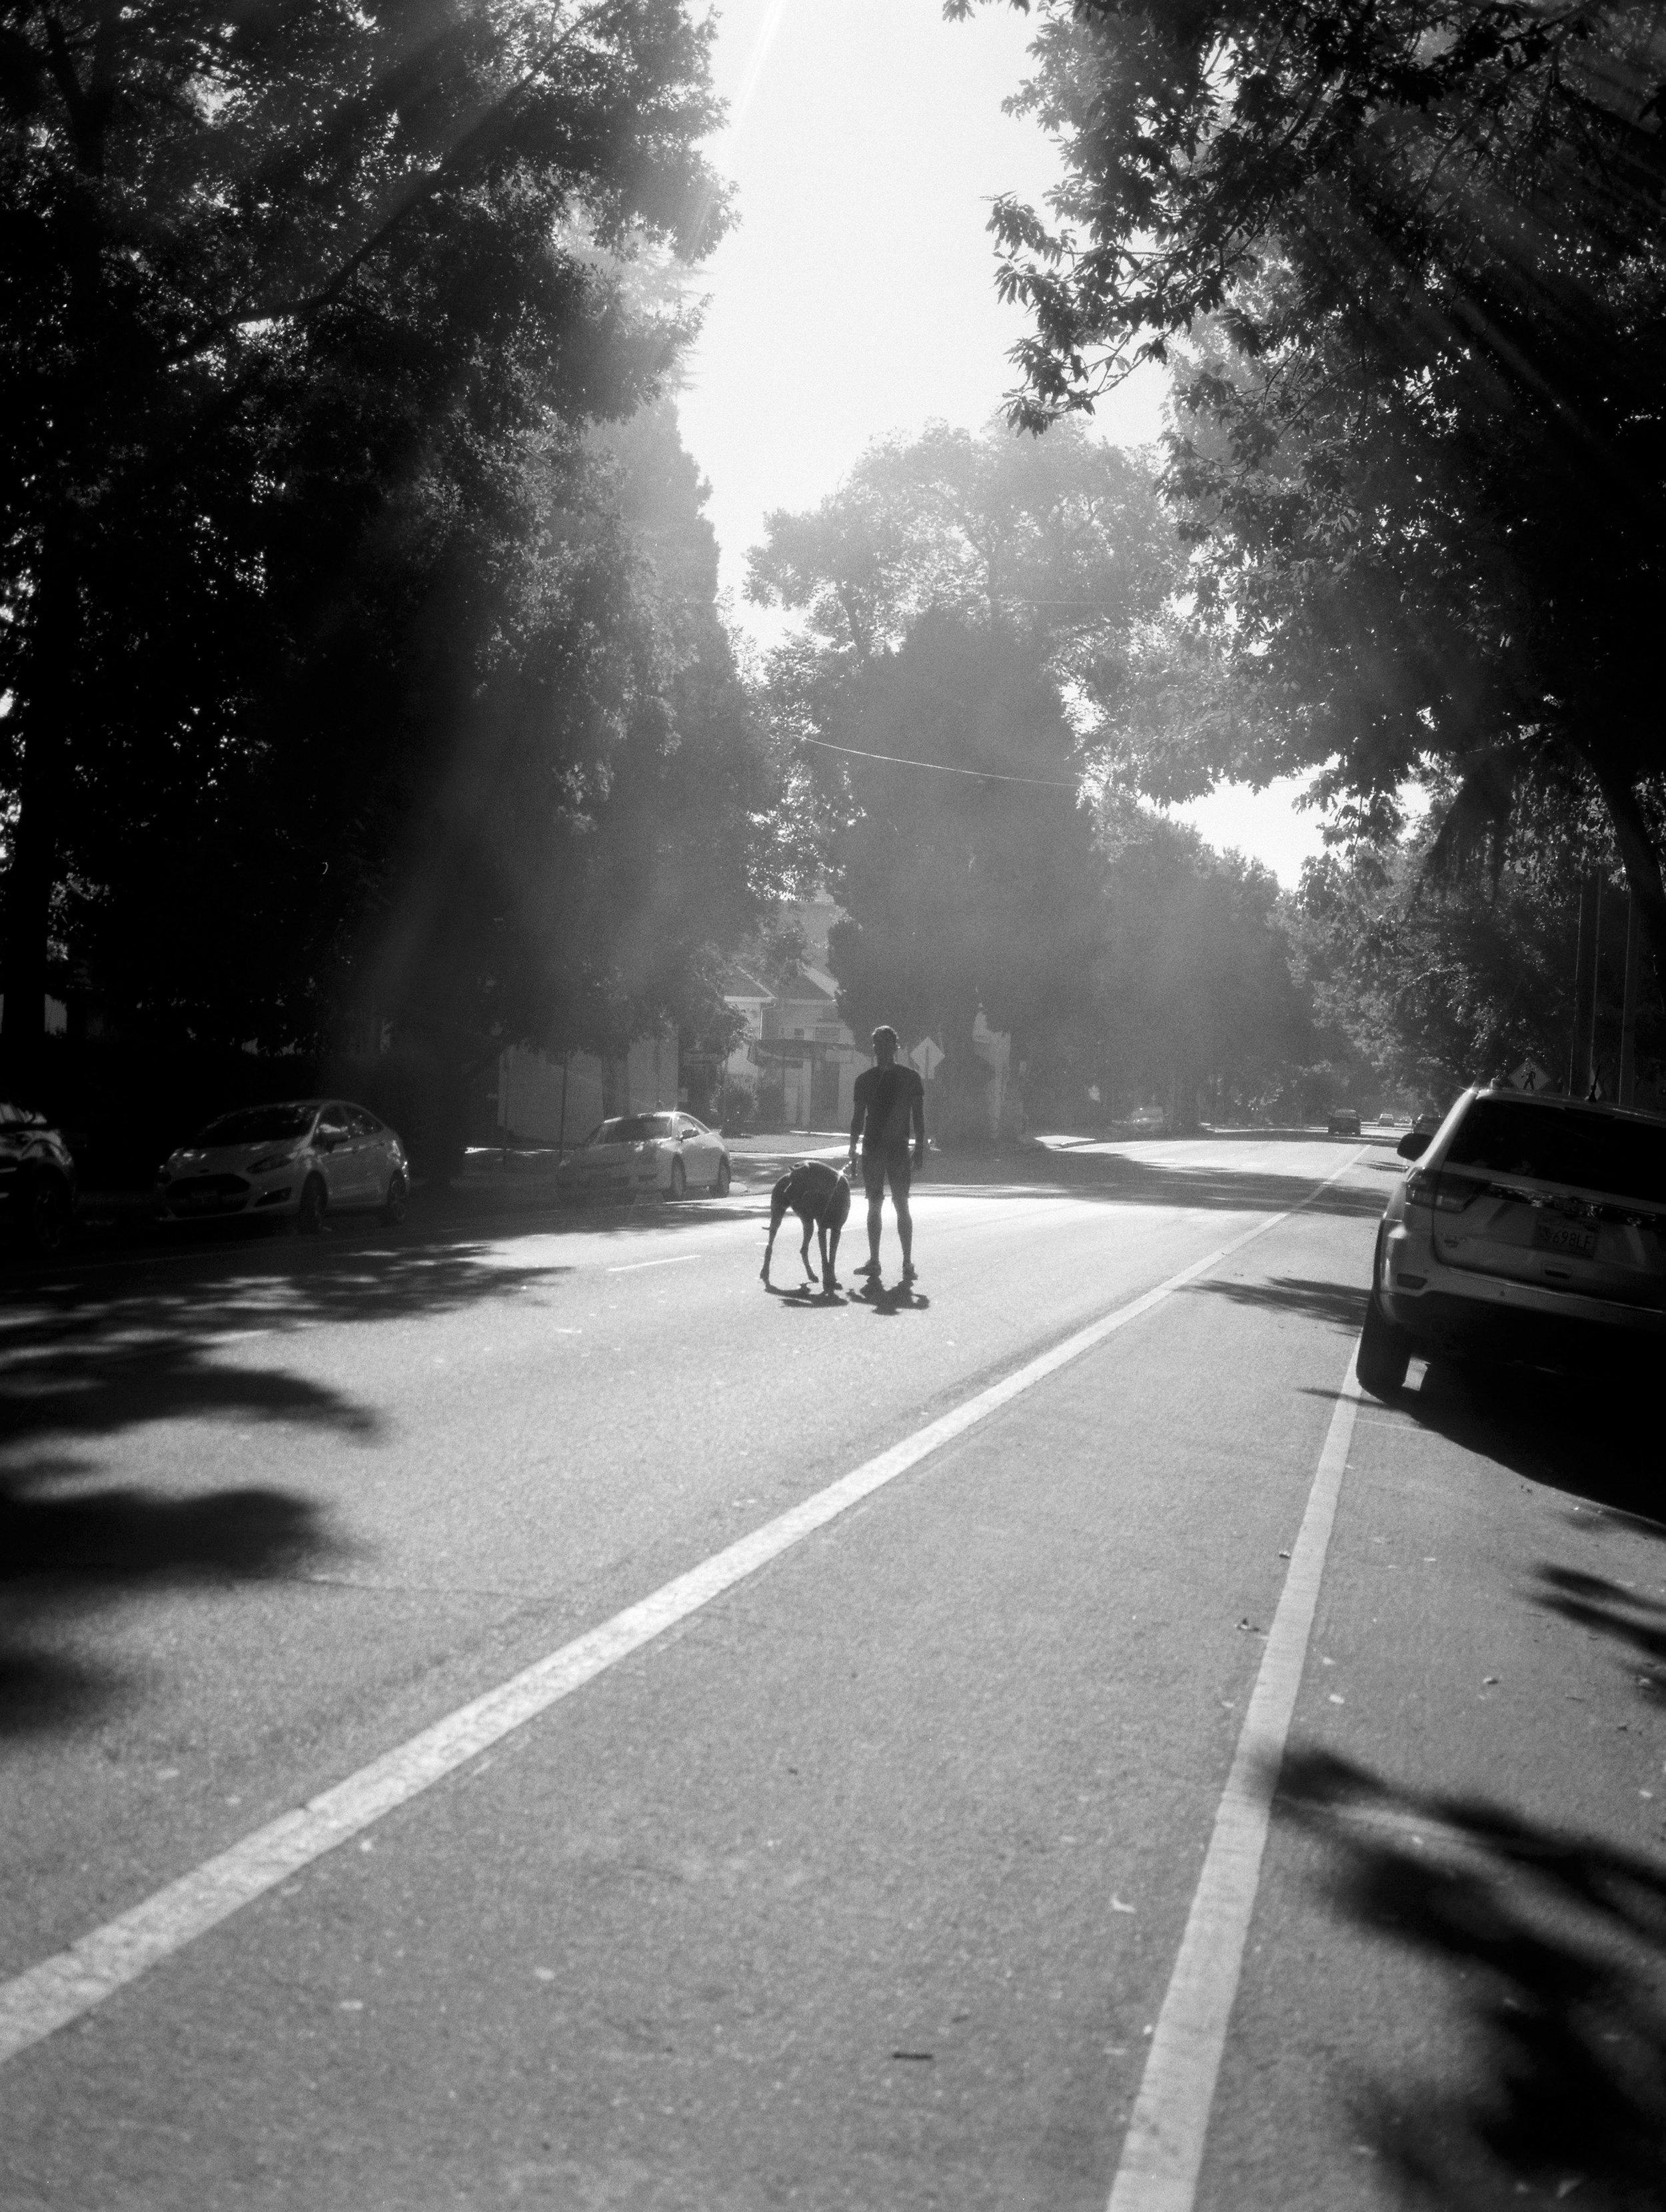 southsidepark-sacramento-family-photography by Rachel Sima Photography